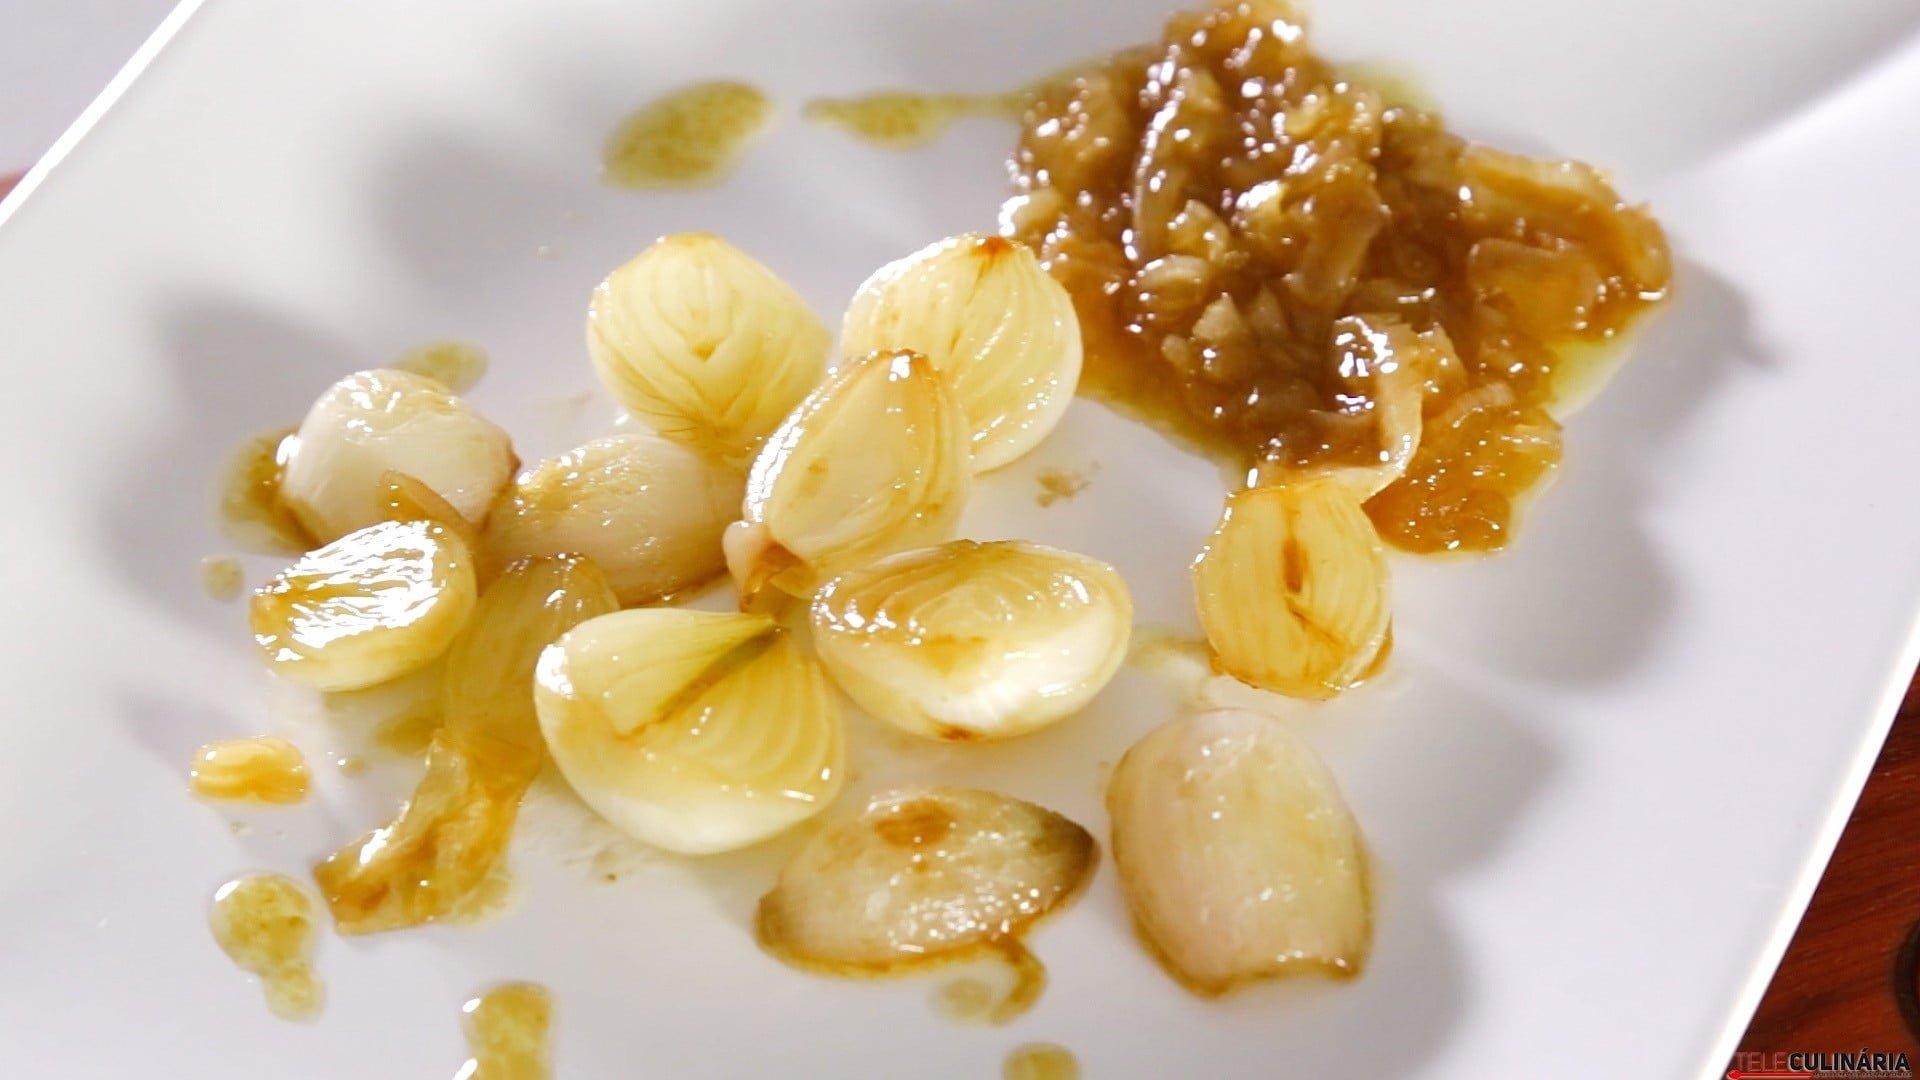 0102 Caramelizar cebola CHLJ